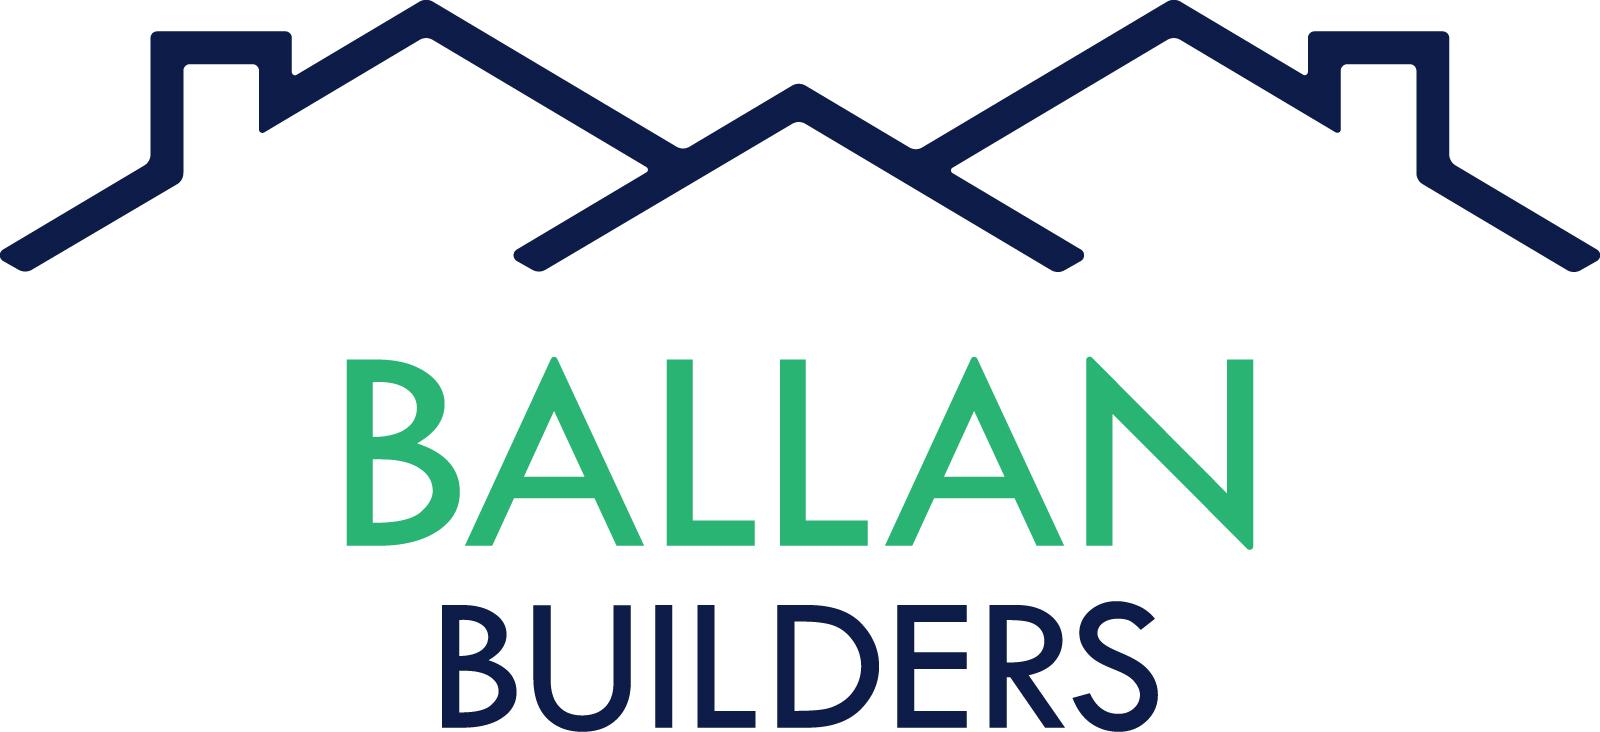 Ballan Builders